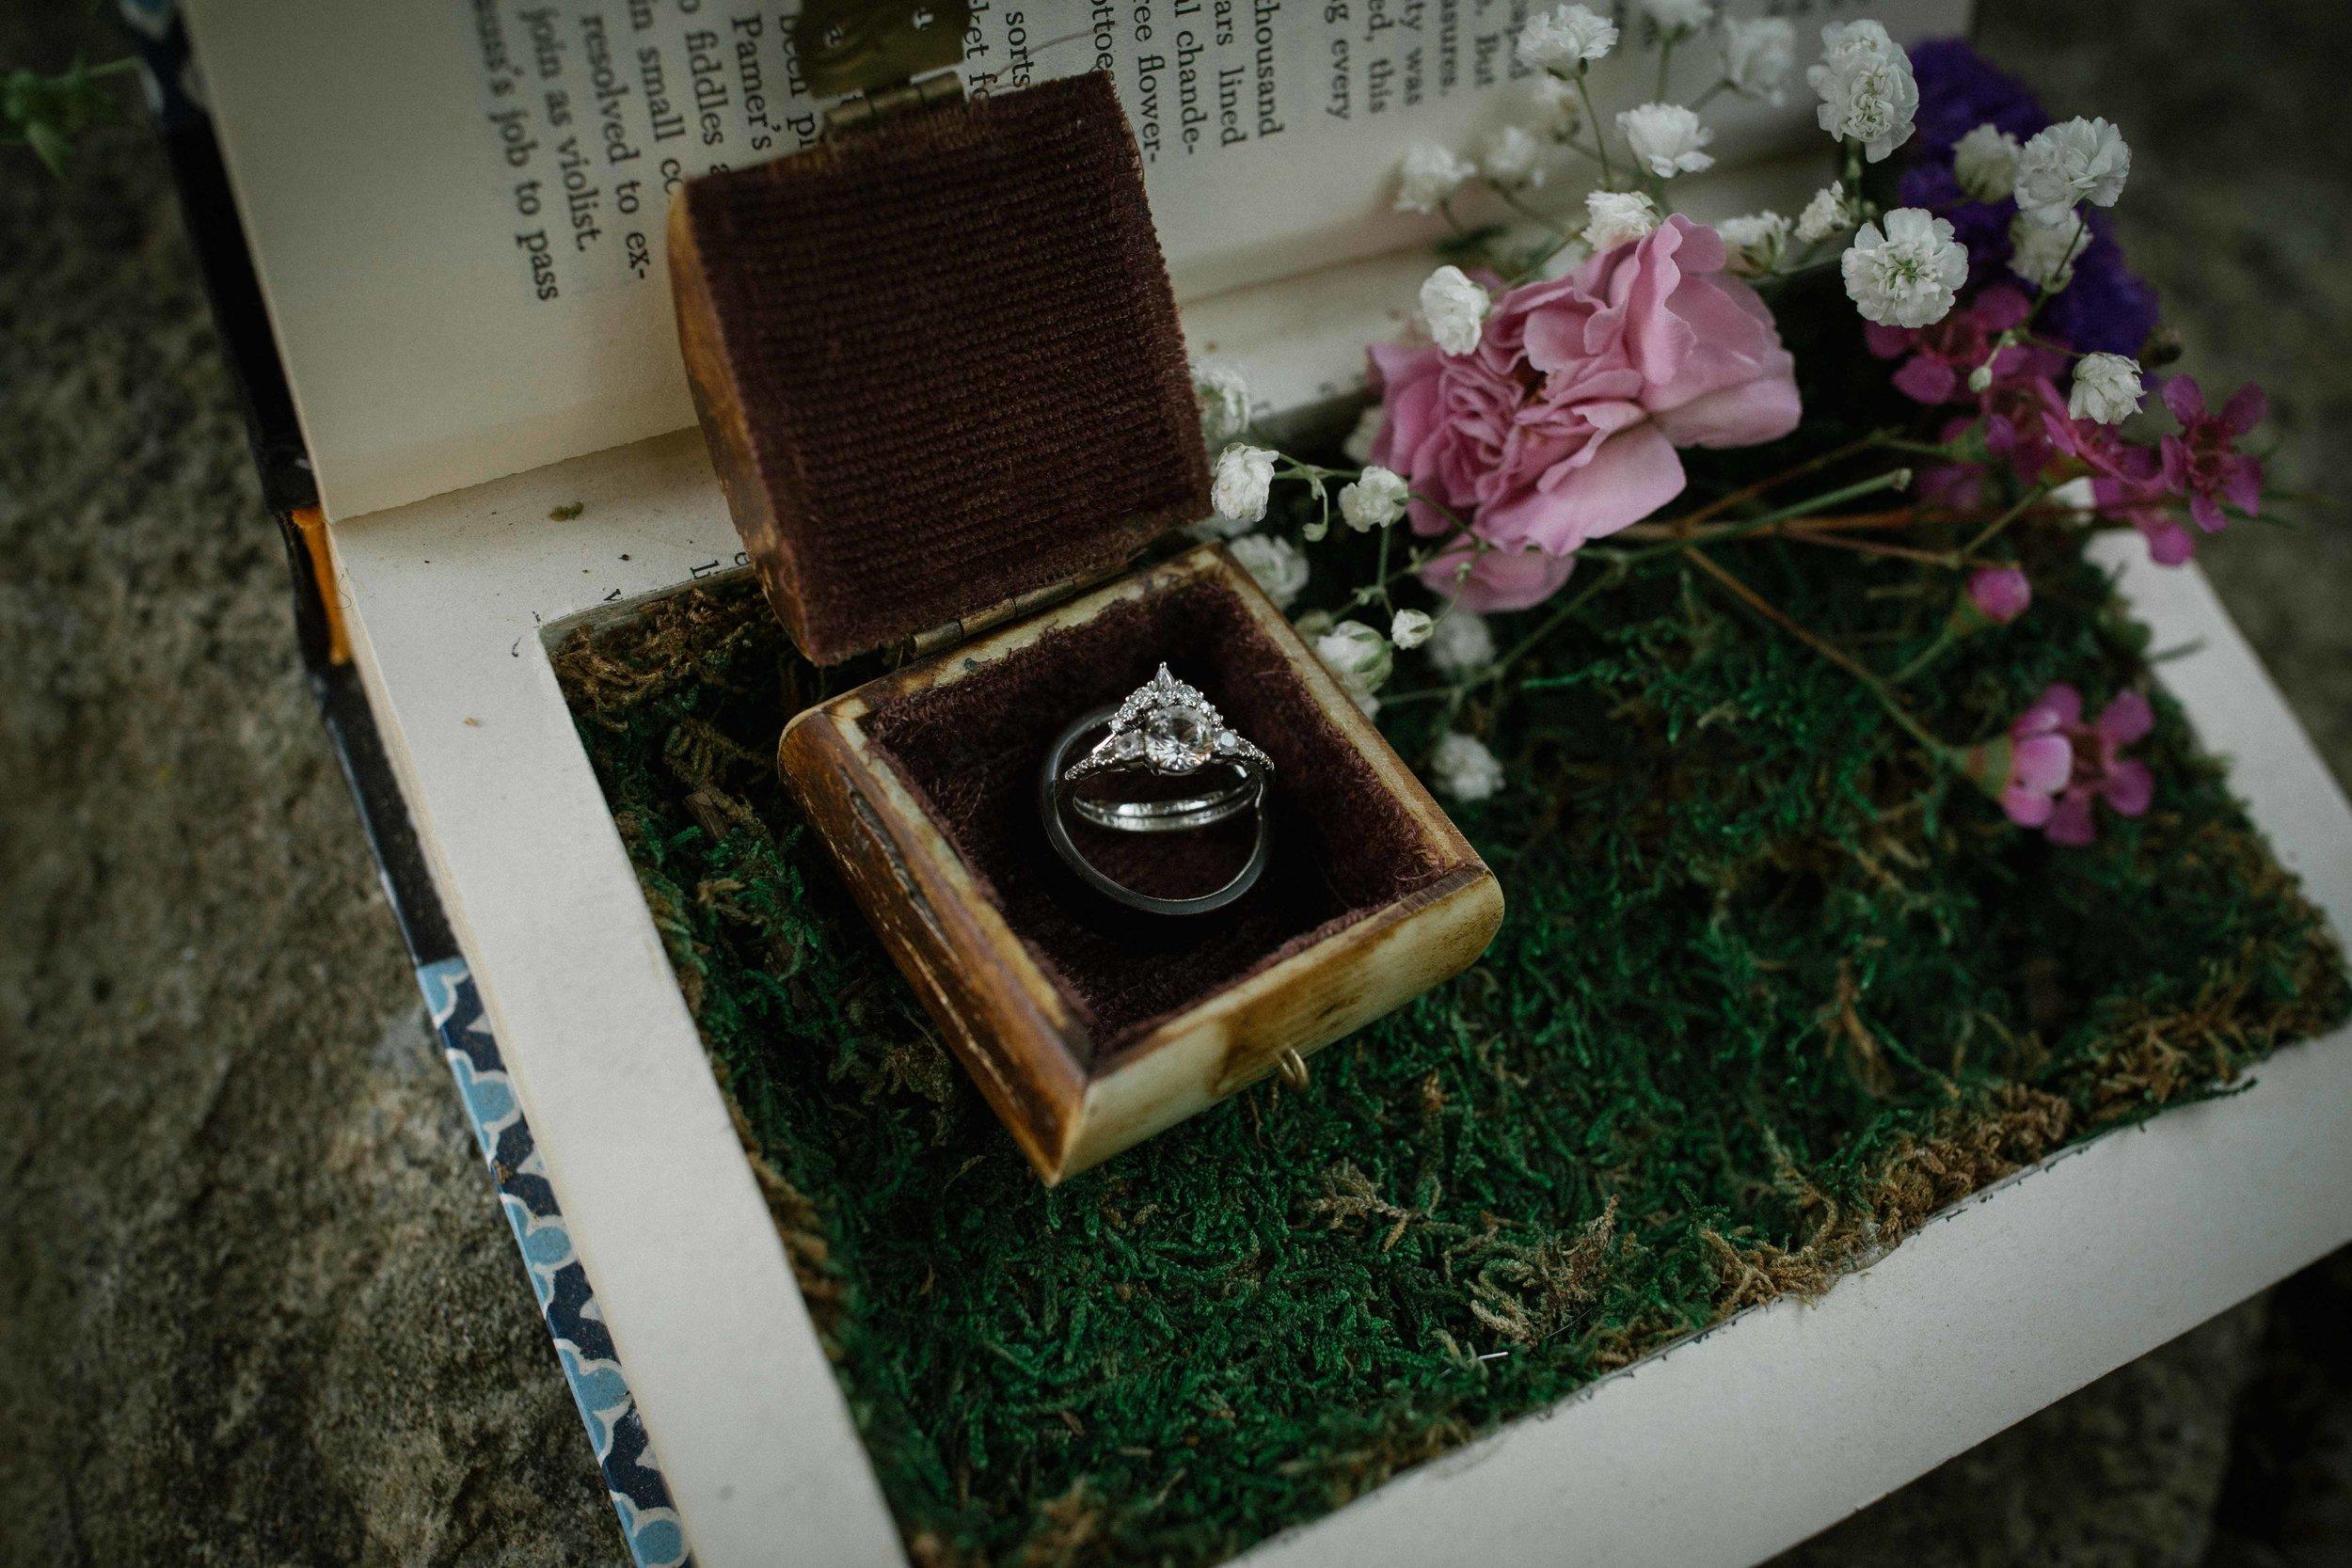 deception-pass-wedding-4.jpg